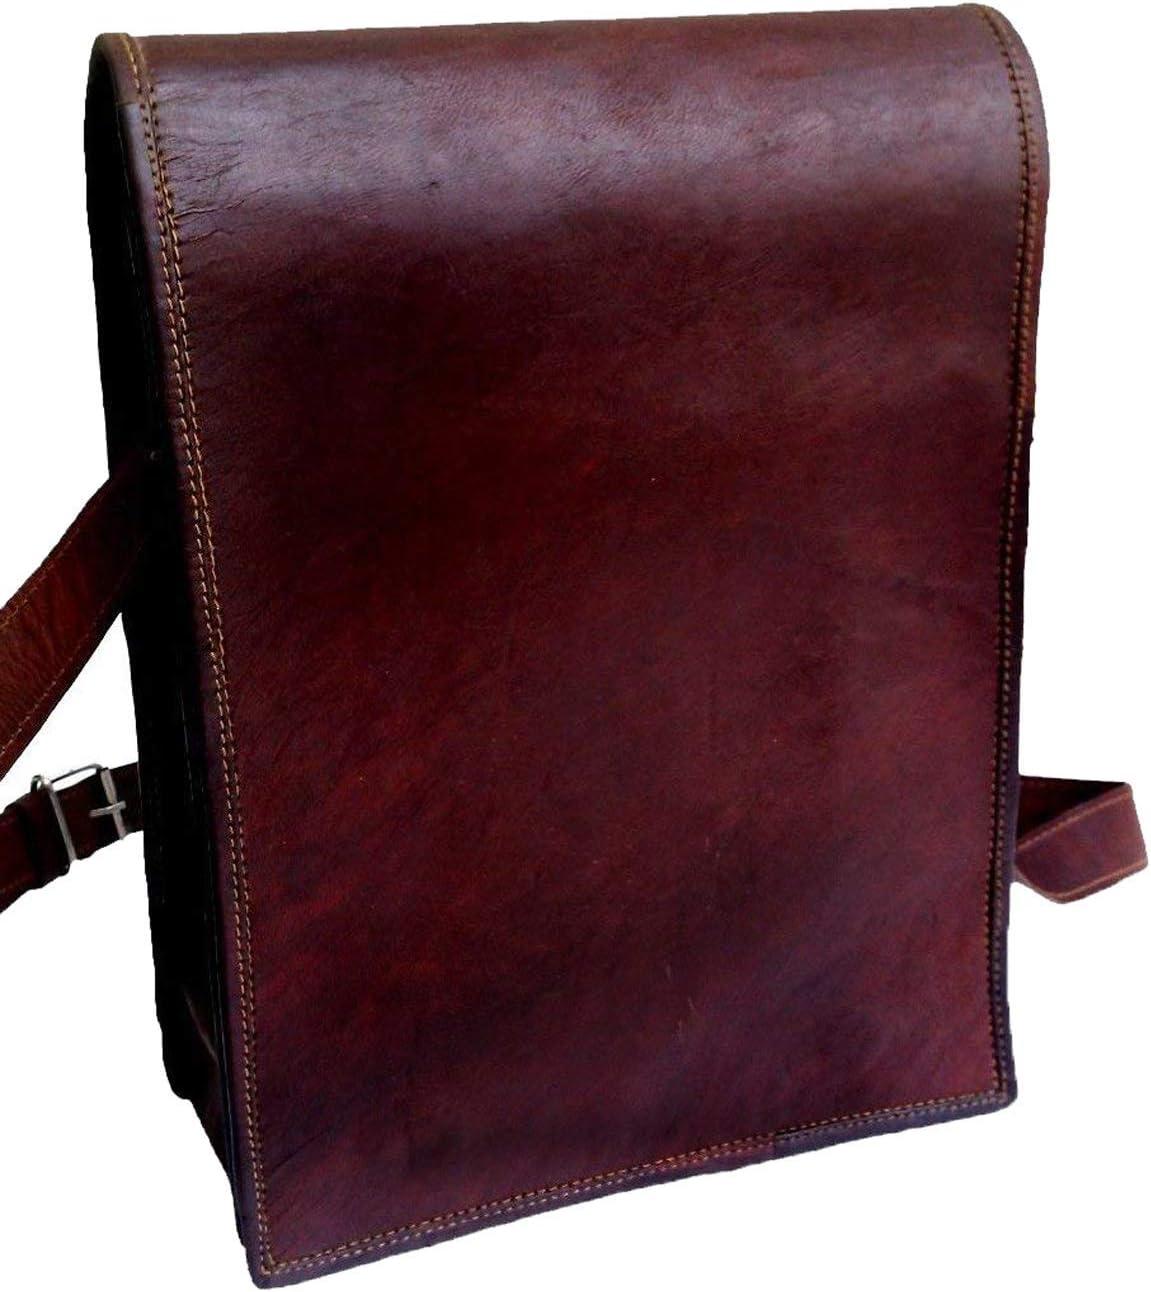 11 small Leather messenger bag shoulder bag cross body vintage messenger bag for women /& men satchel man purse competible with Ipad and tablet